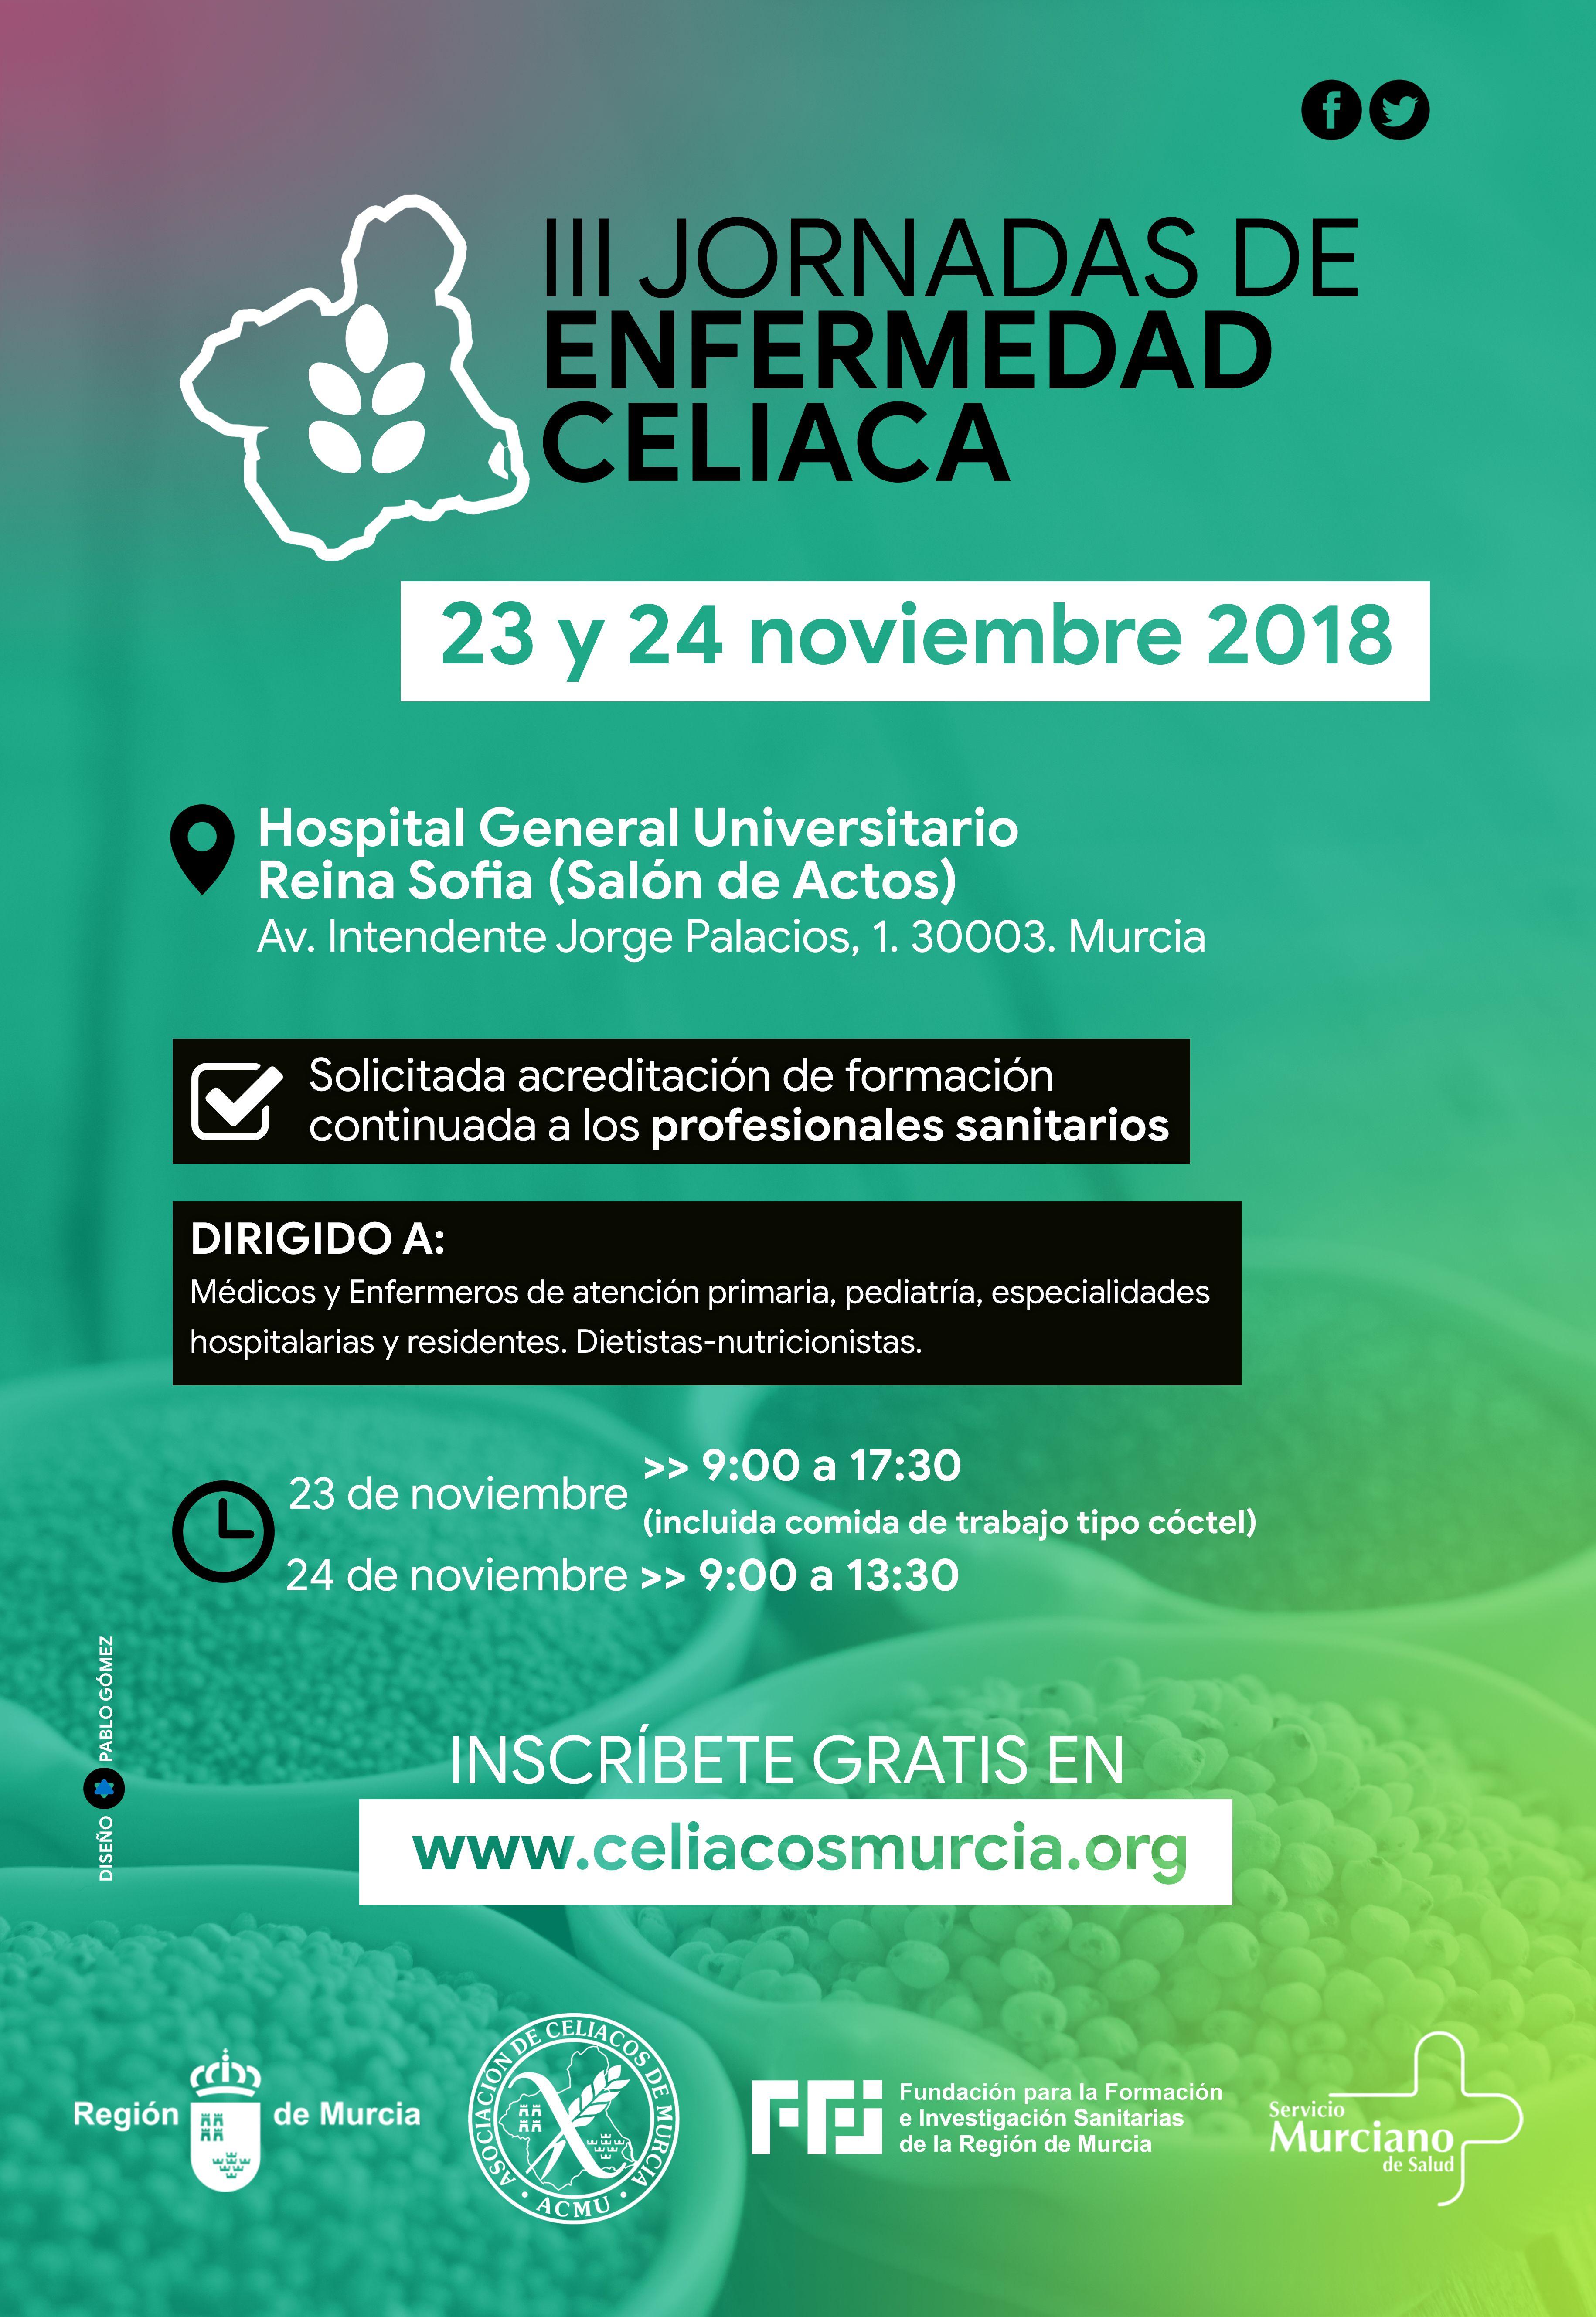 III Jornadas de Enfermedad Celiaca scaled